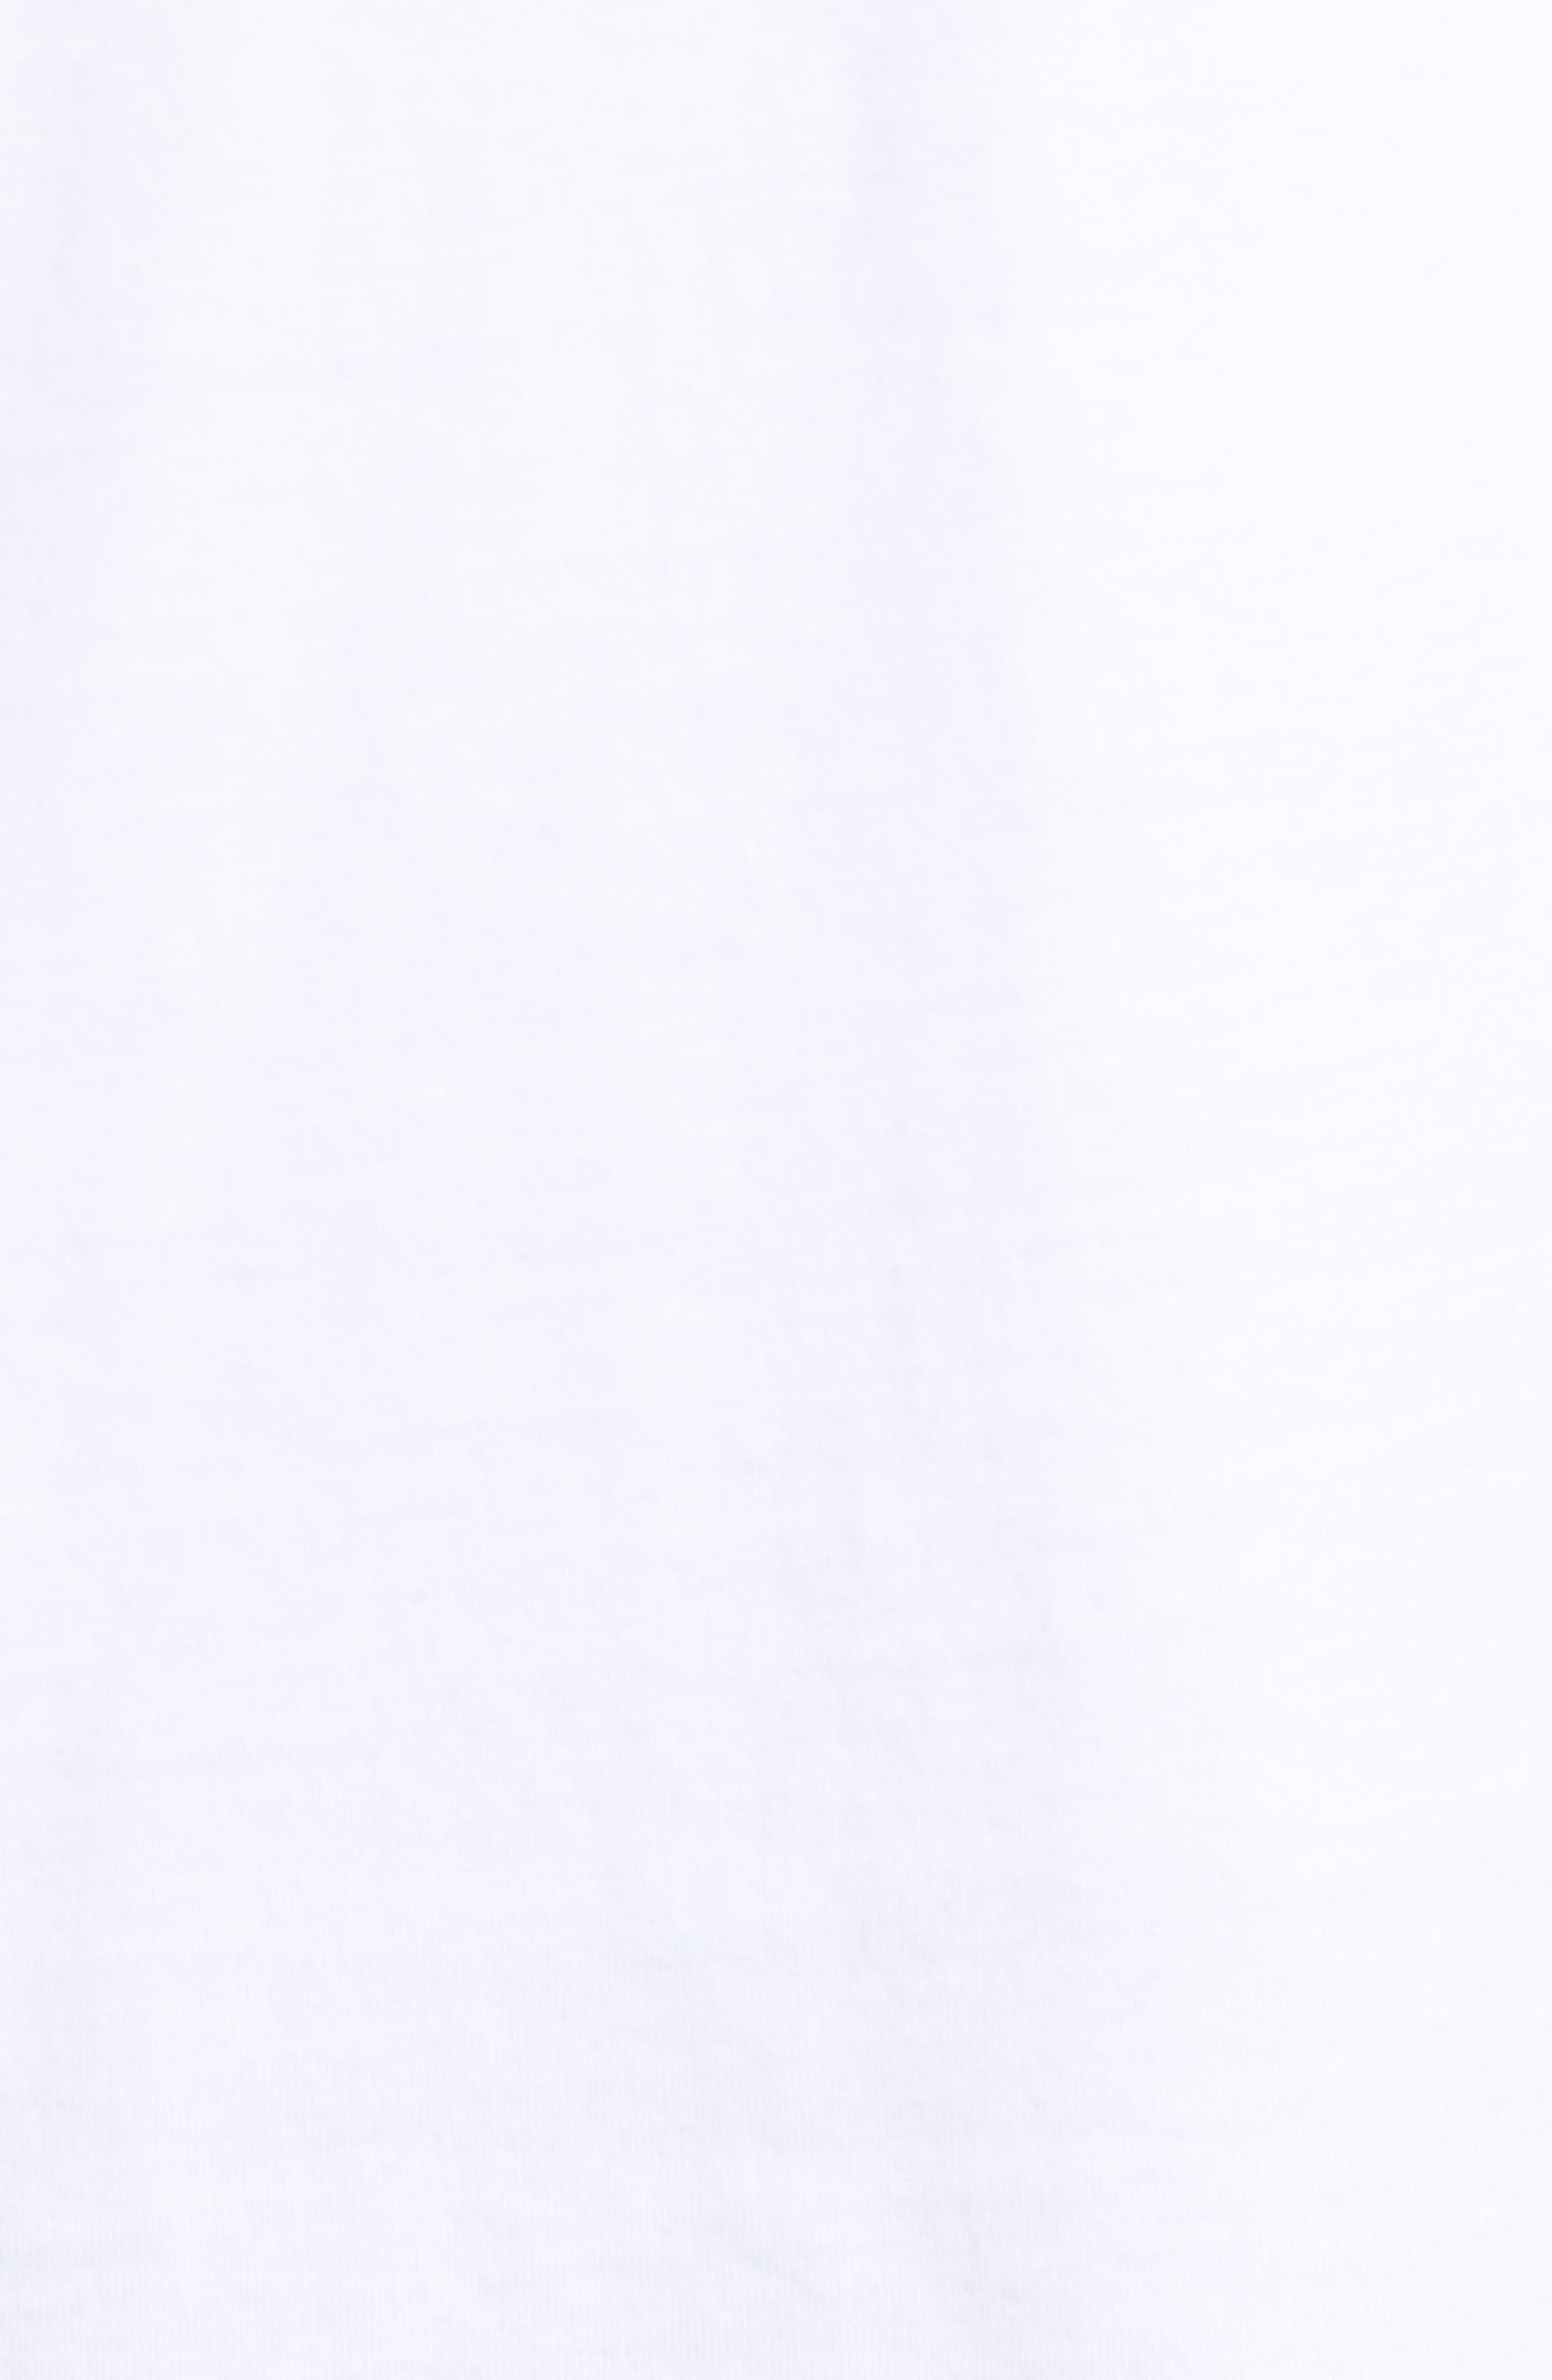 Spinnaker Sail Long Sleeve Pocket T-Shirt,                             Alternate thumbnail 5, color,                             100